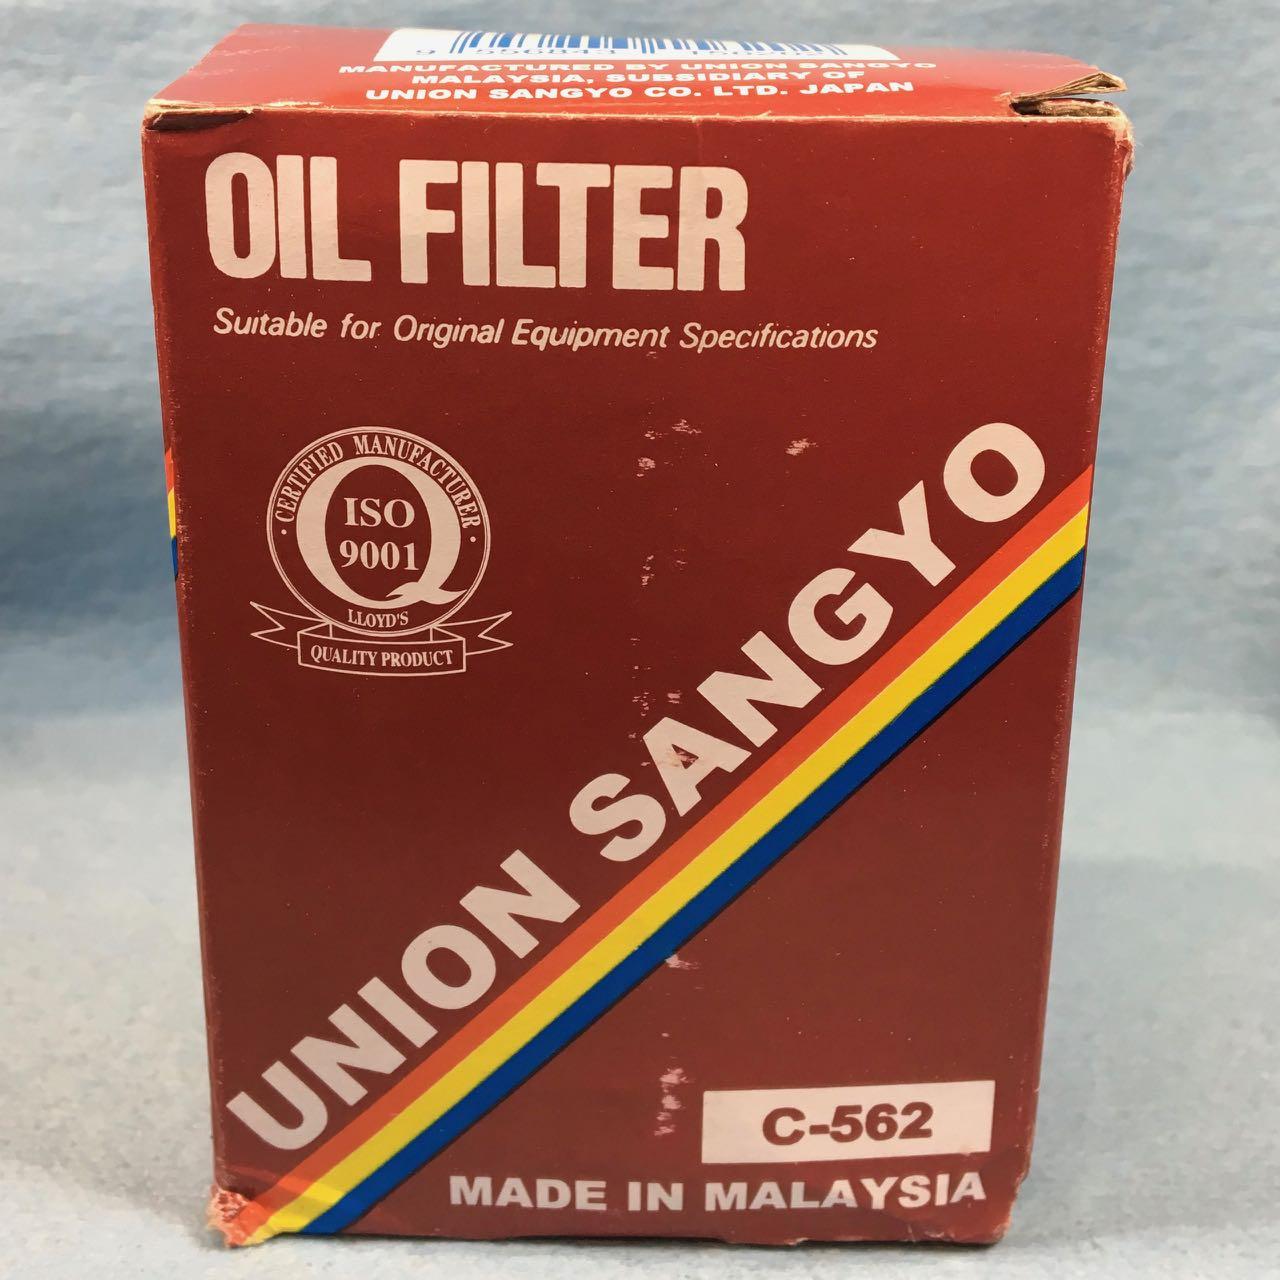 Cut Open] Union Sangyo C-562 - Virgin (7317 EQ) - Bob Is The